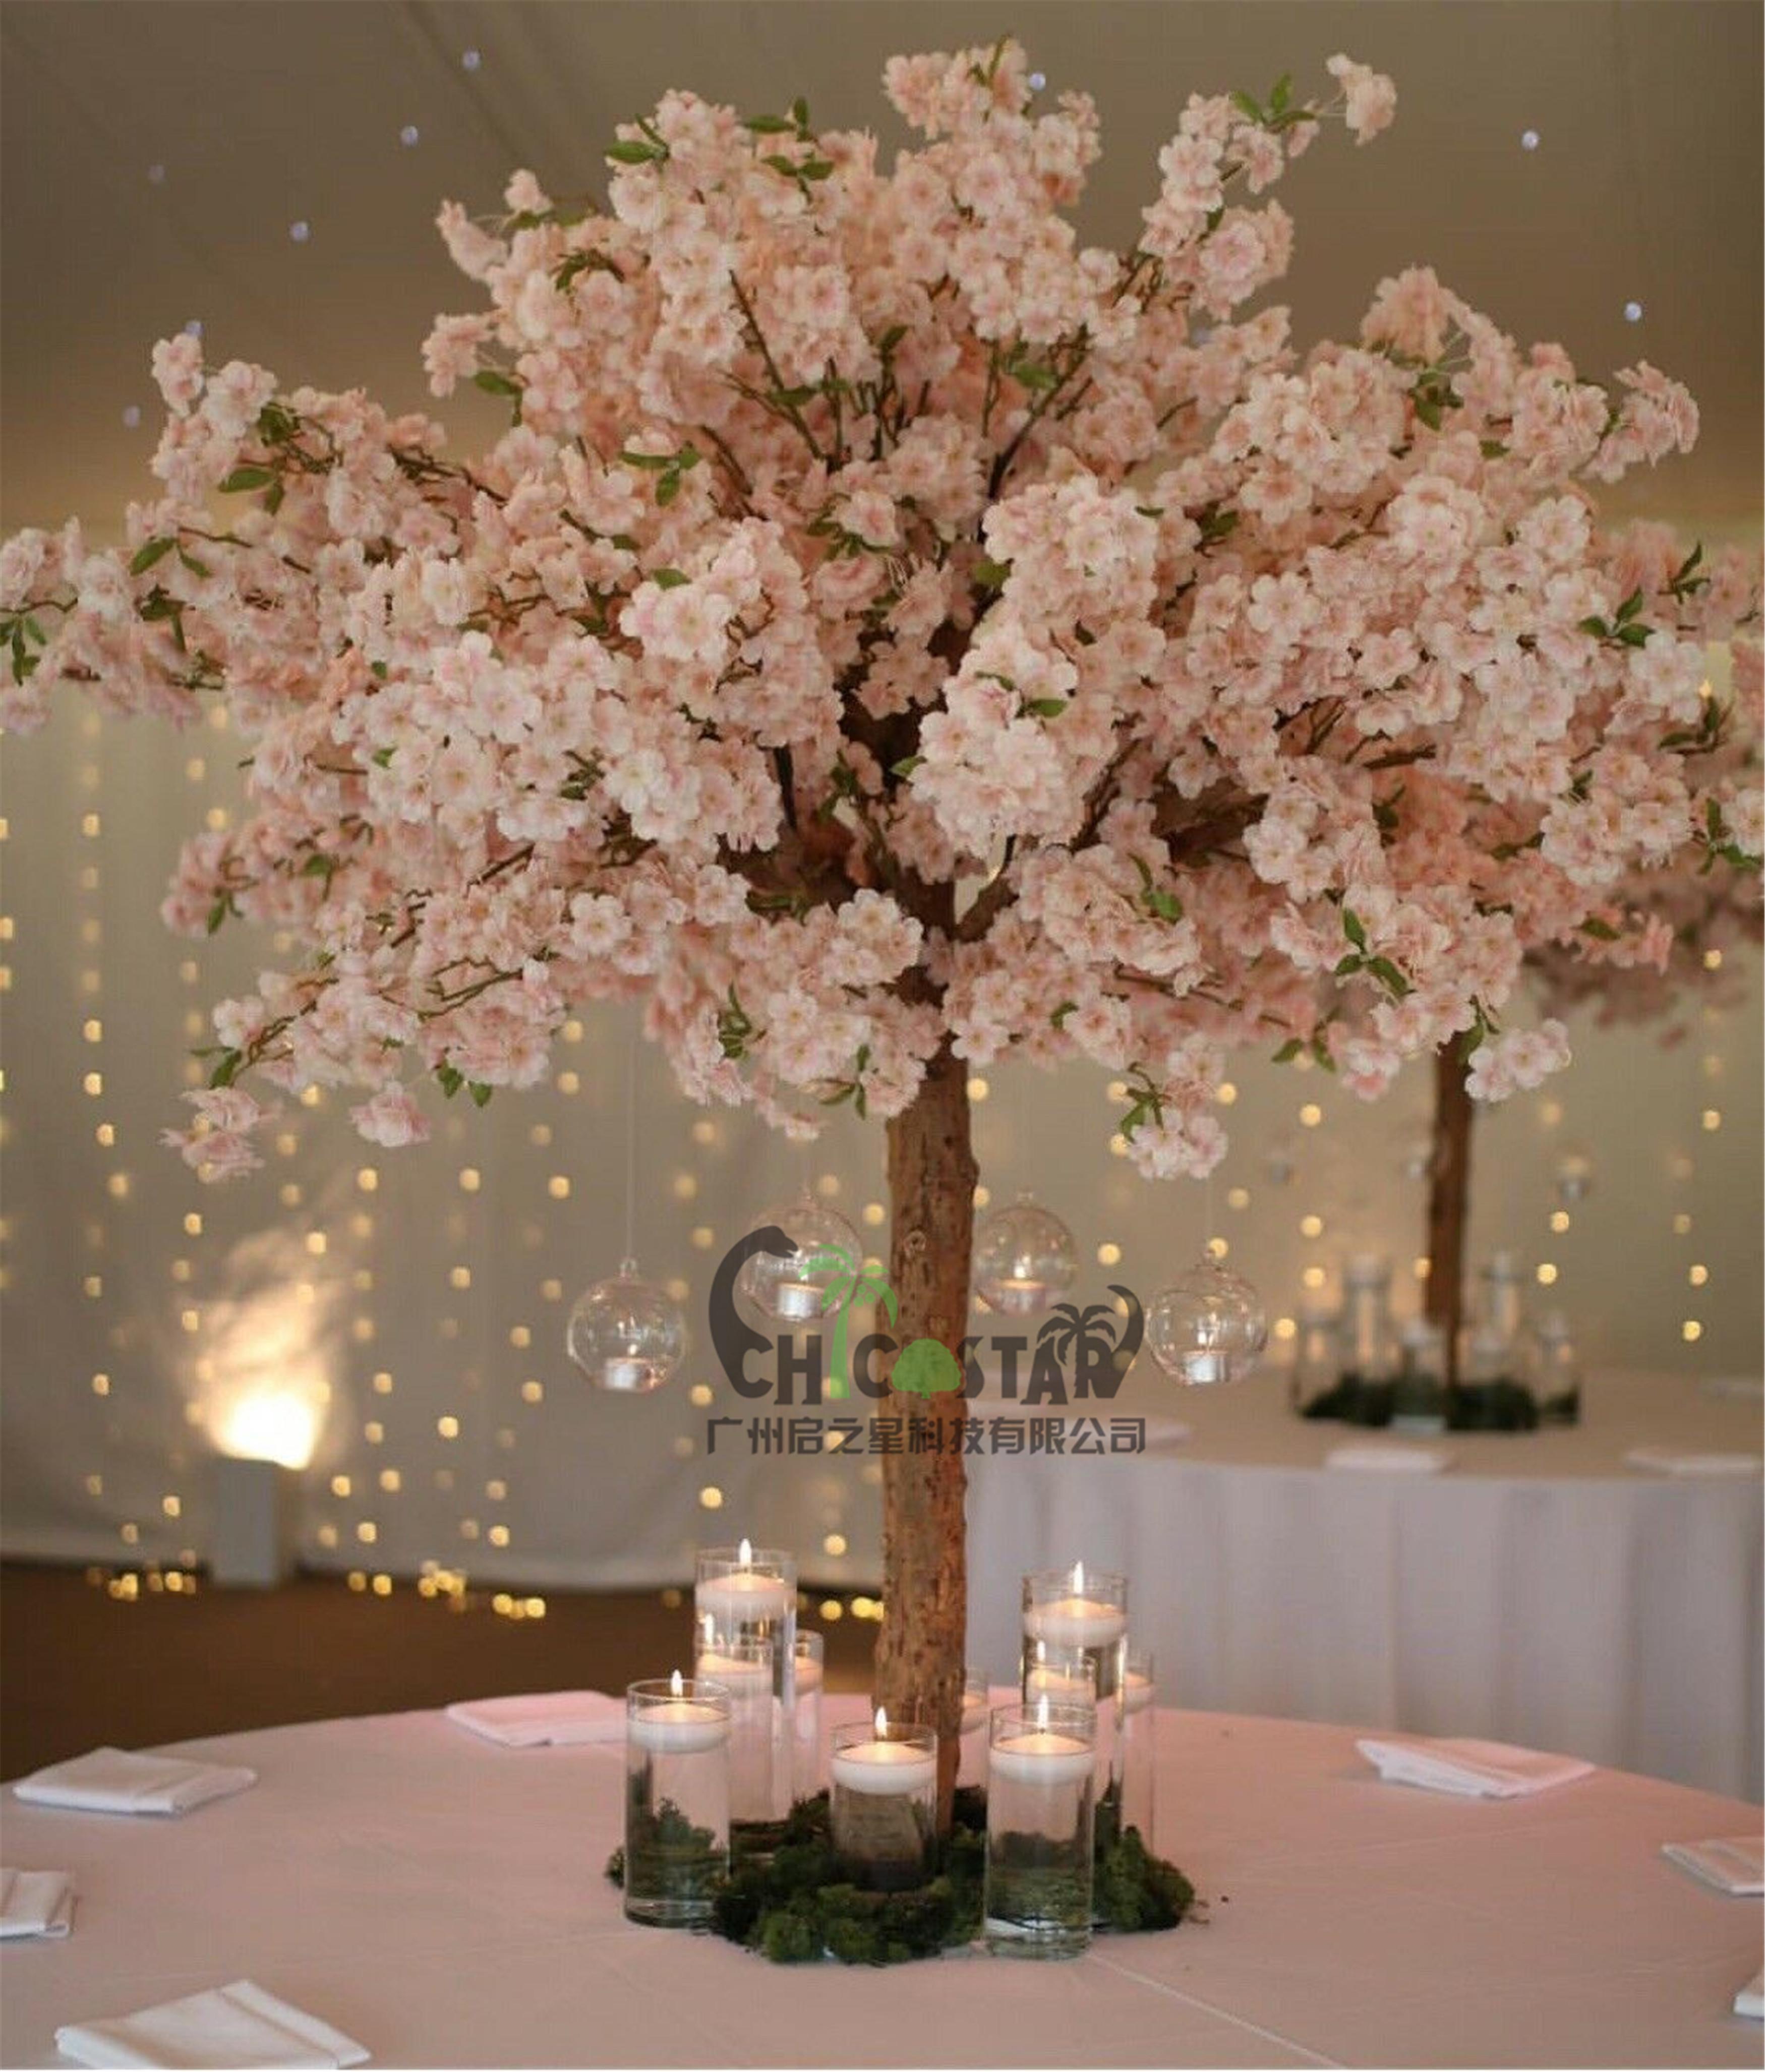 Wedding Table Centerpieces Artificial Cherry Blossom Tree/ Indoor Usage  Mini Sakura Blossom Tree Pink - Buy Wedding Table Cherry Blossom Tree, Wedding Table Centerpieces Artificial Tree,Mini Sakura Blossom Tree Product  on Alibaba.com